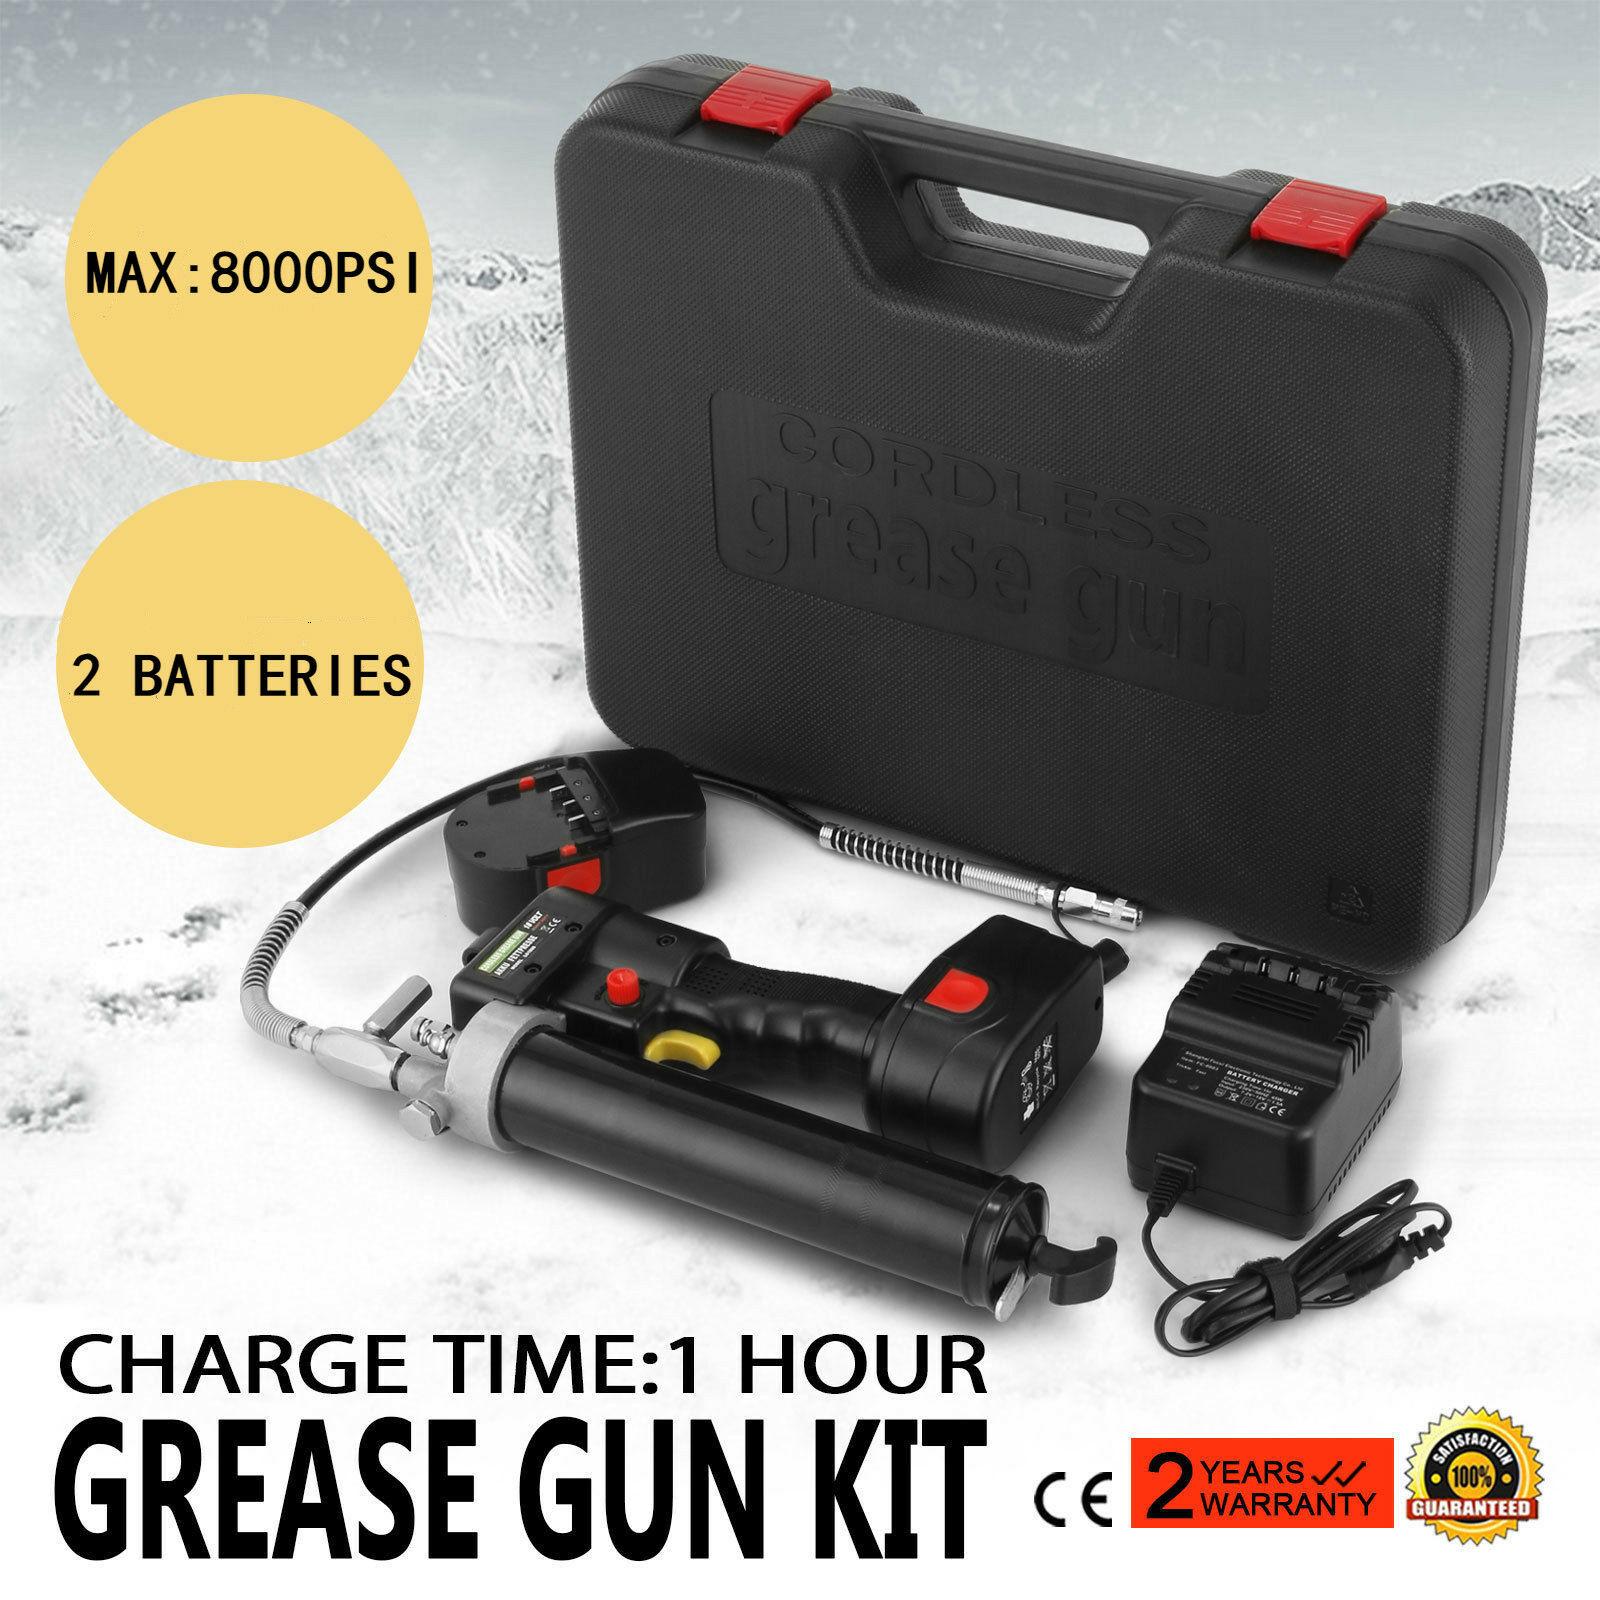 Electrical Grease Gun Cordless Battery 18V 107cm 8000PSI Heavy + 2 Batteries